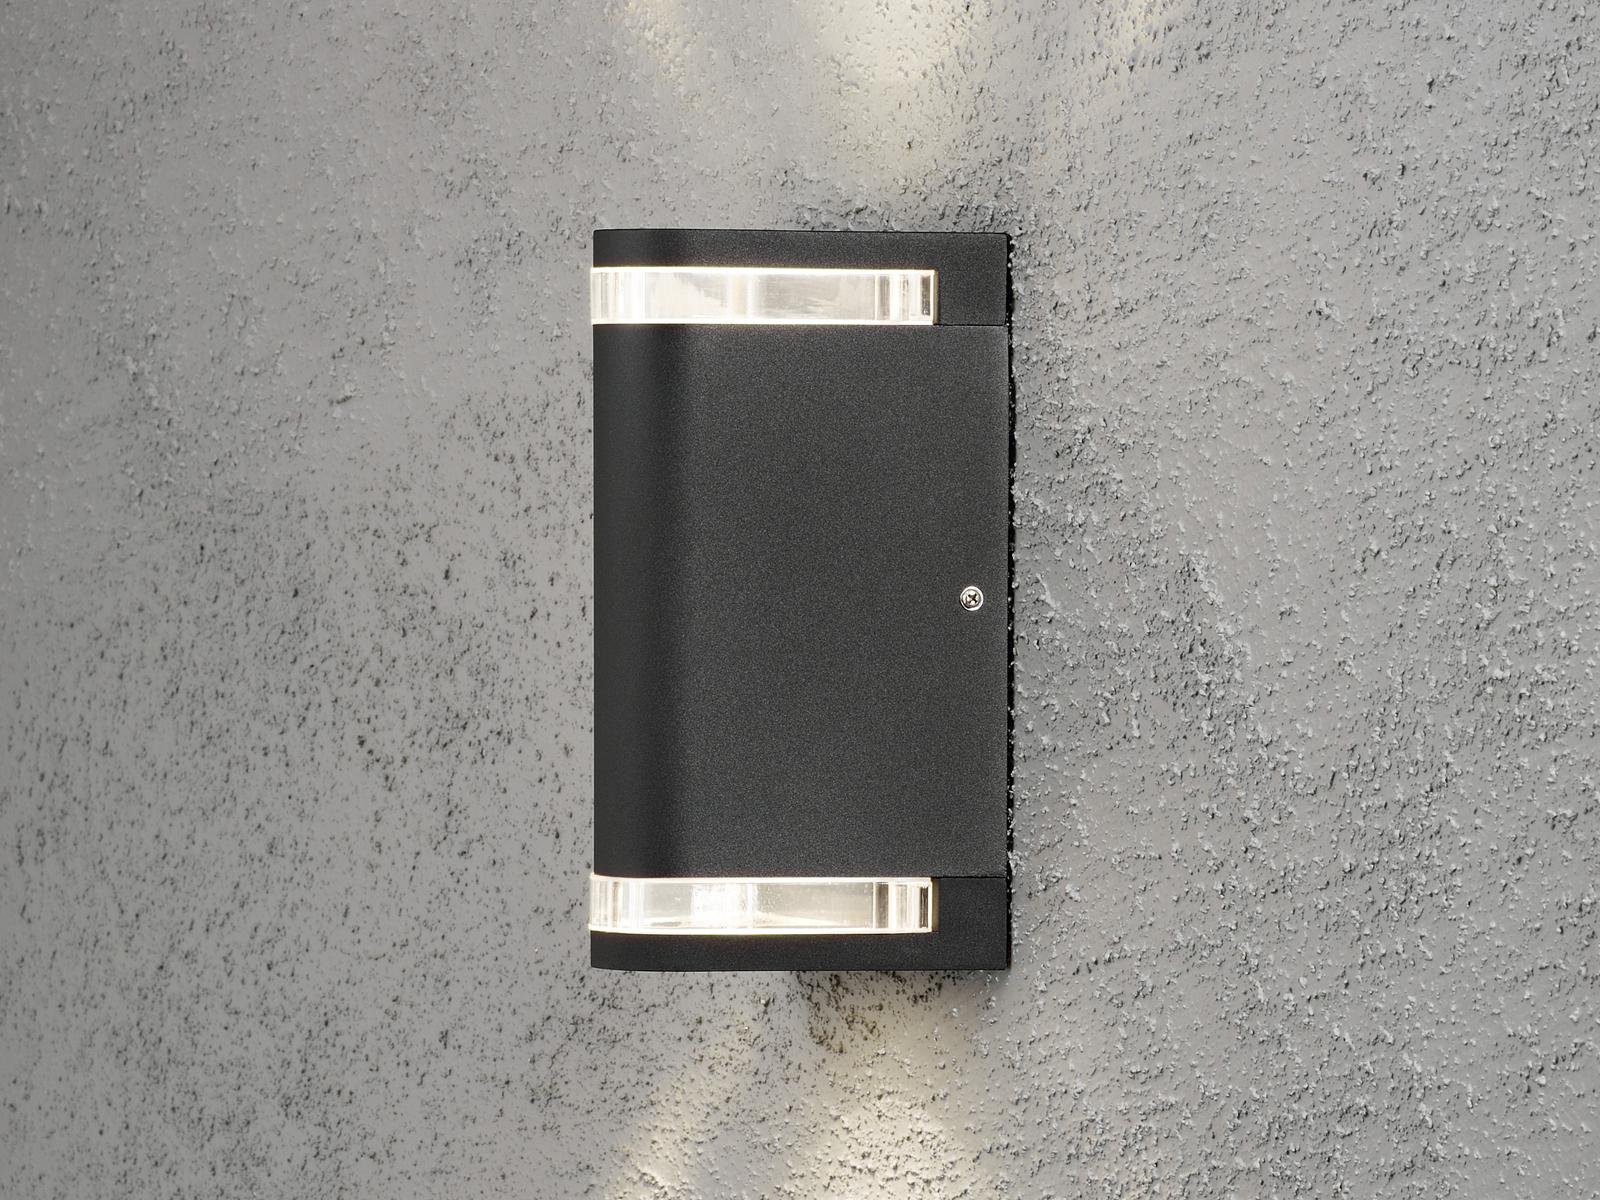 Up-DOWN PARETE LAMPADA ALLUMINIO MODENA nero, gu10, gu10, gu10, altezza 24 CM, ip44 8eed4d